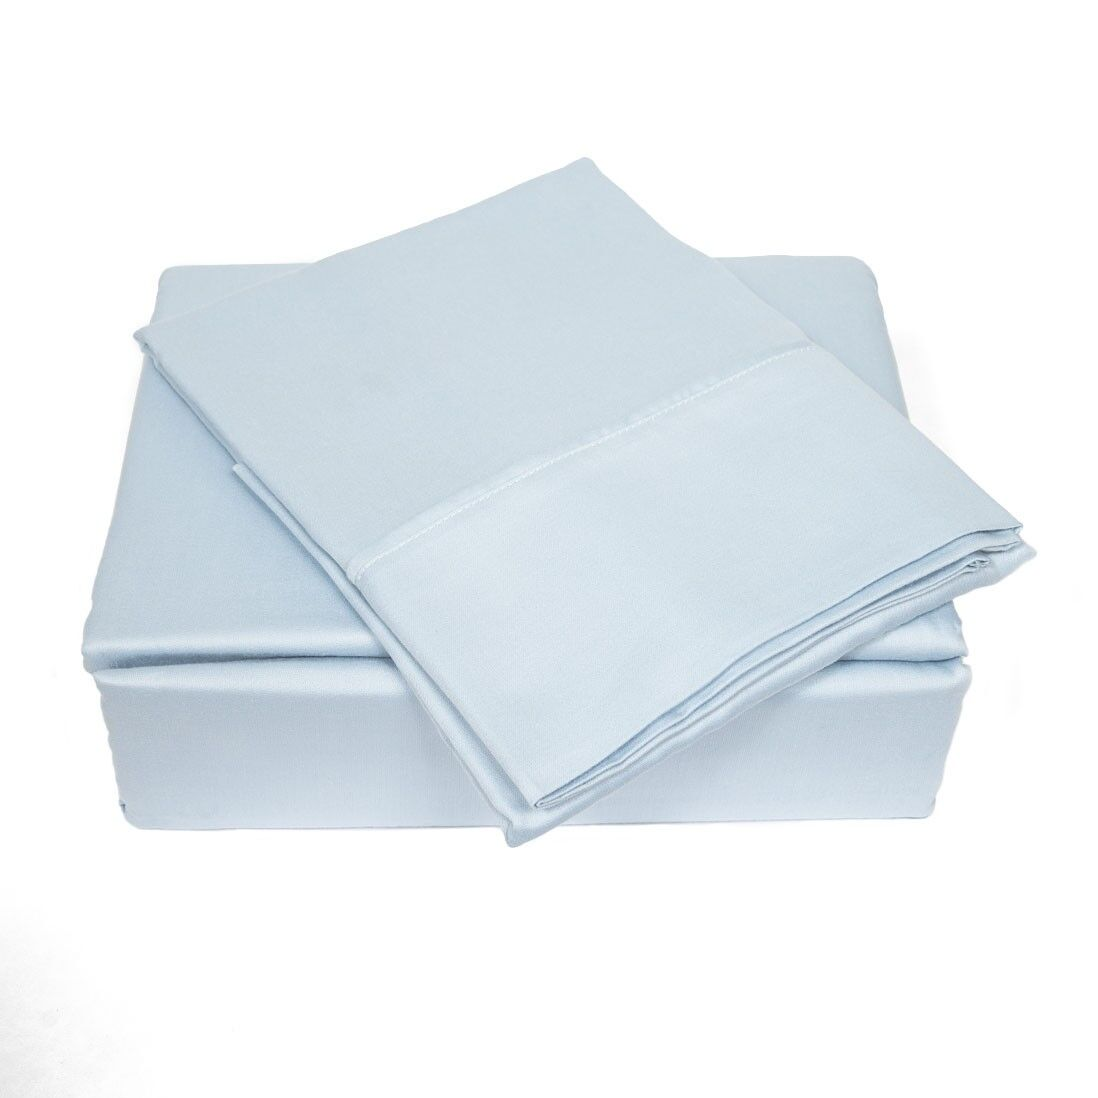 300 Thread Count Sheet Set Size: King, Color: Sky Blue